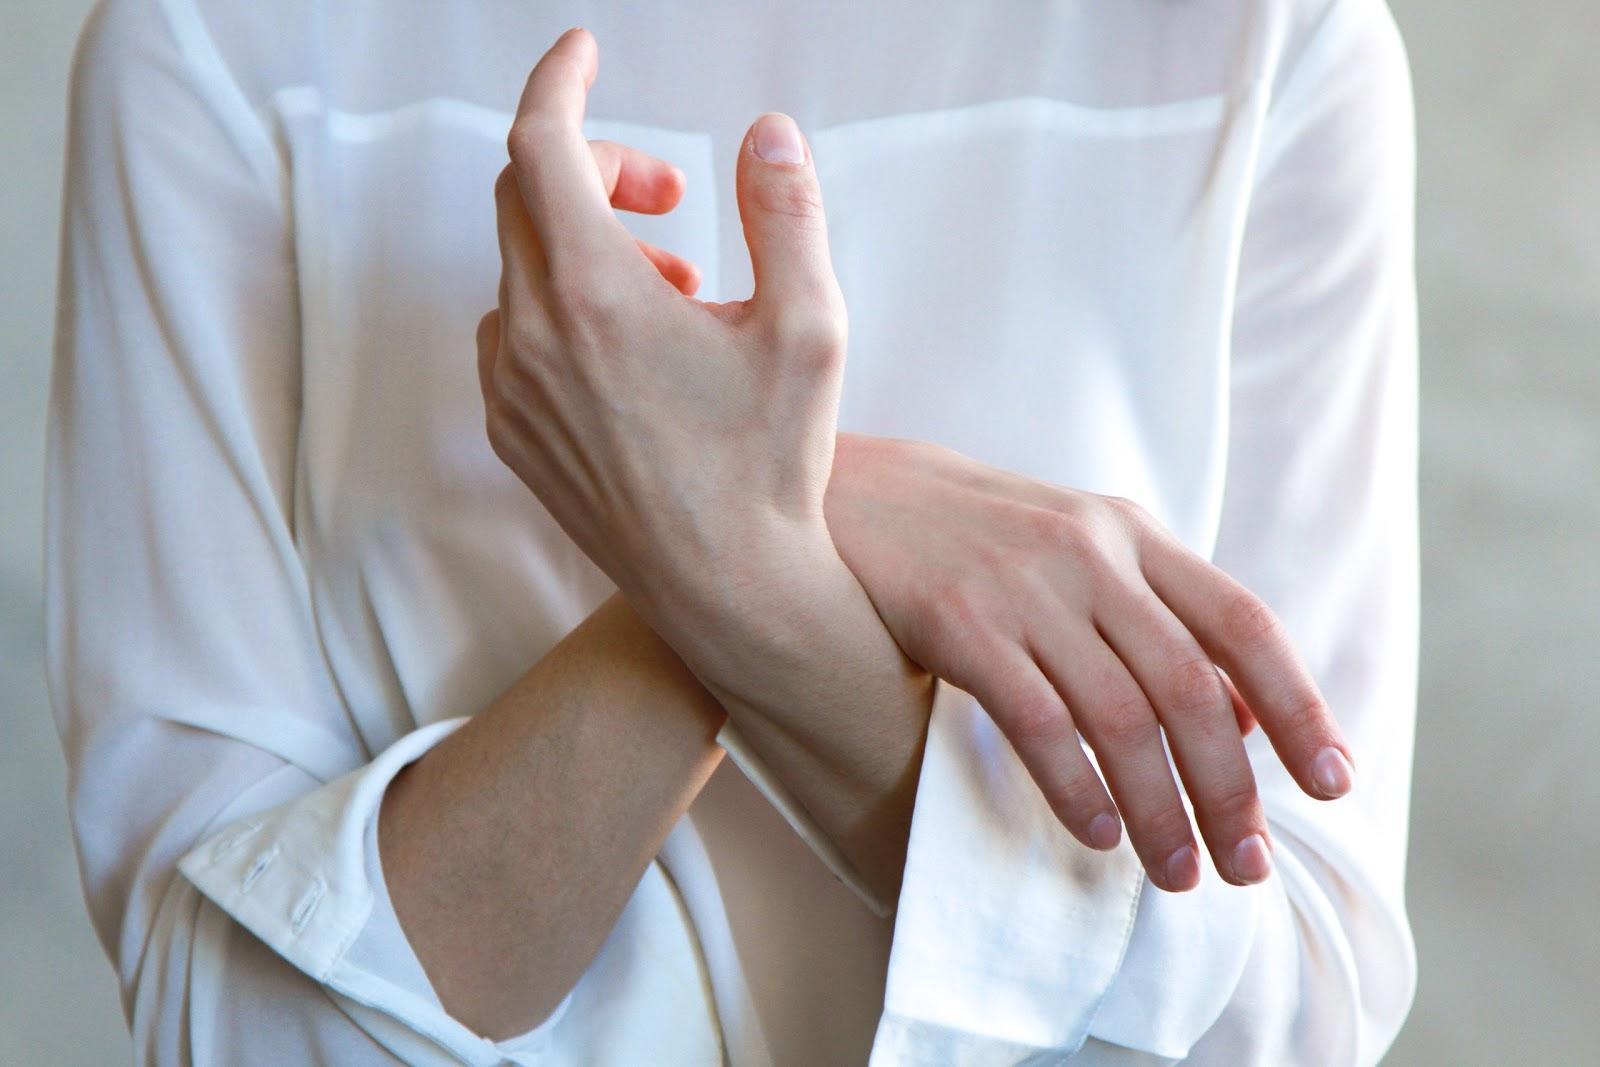 maos entrelacadas lupus